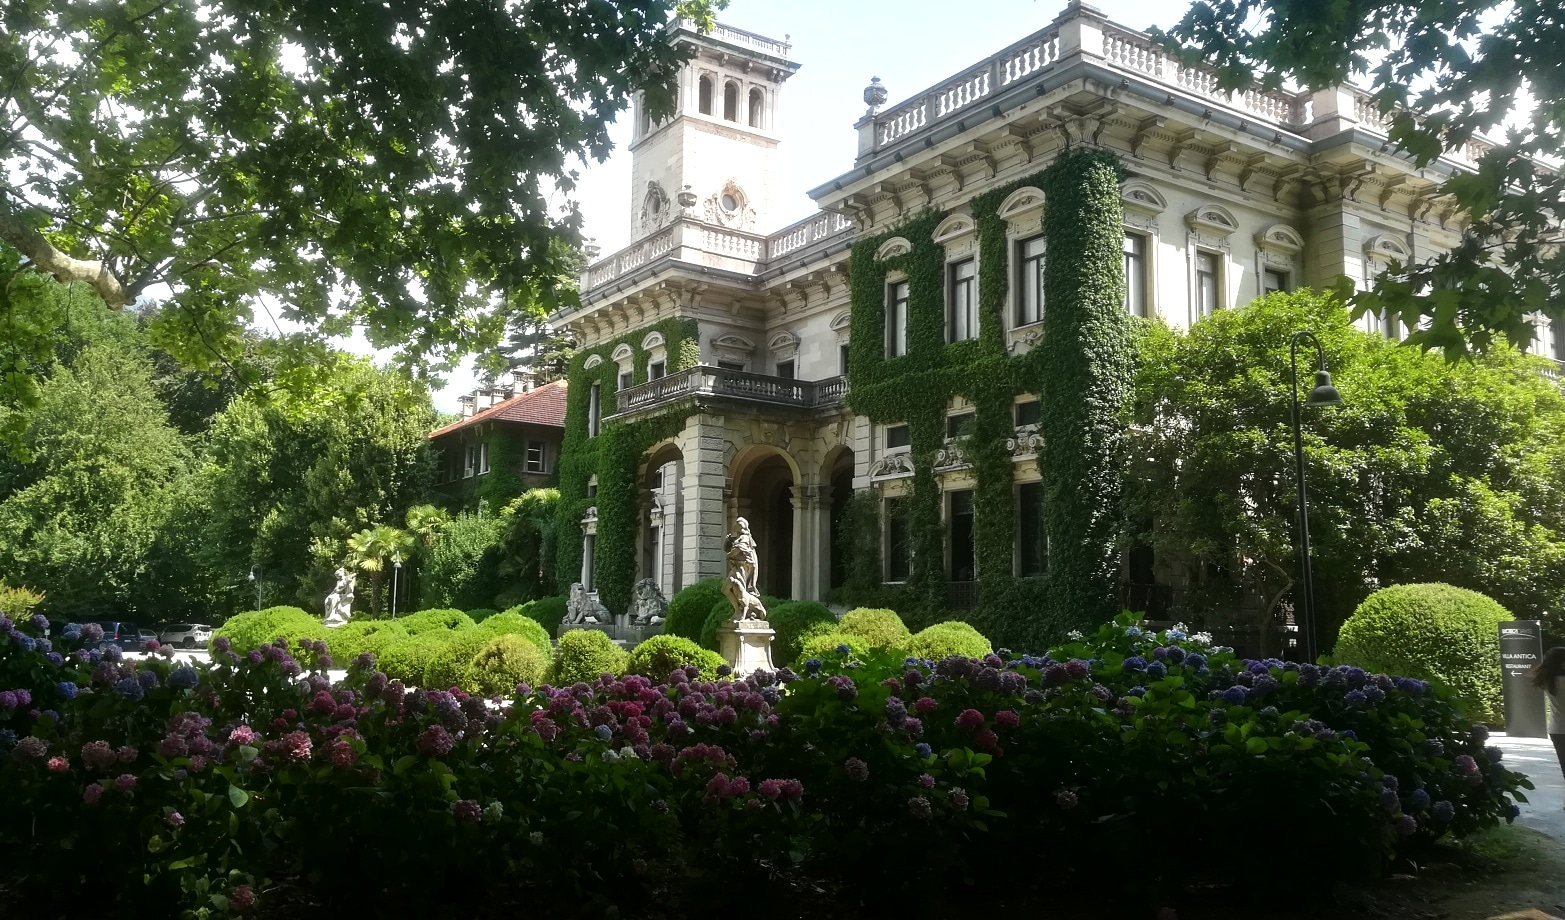 villa-erba-mp-2018-2